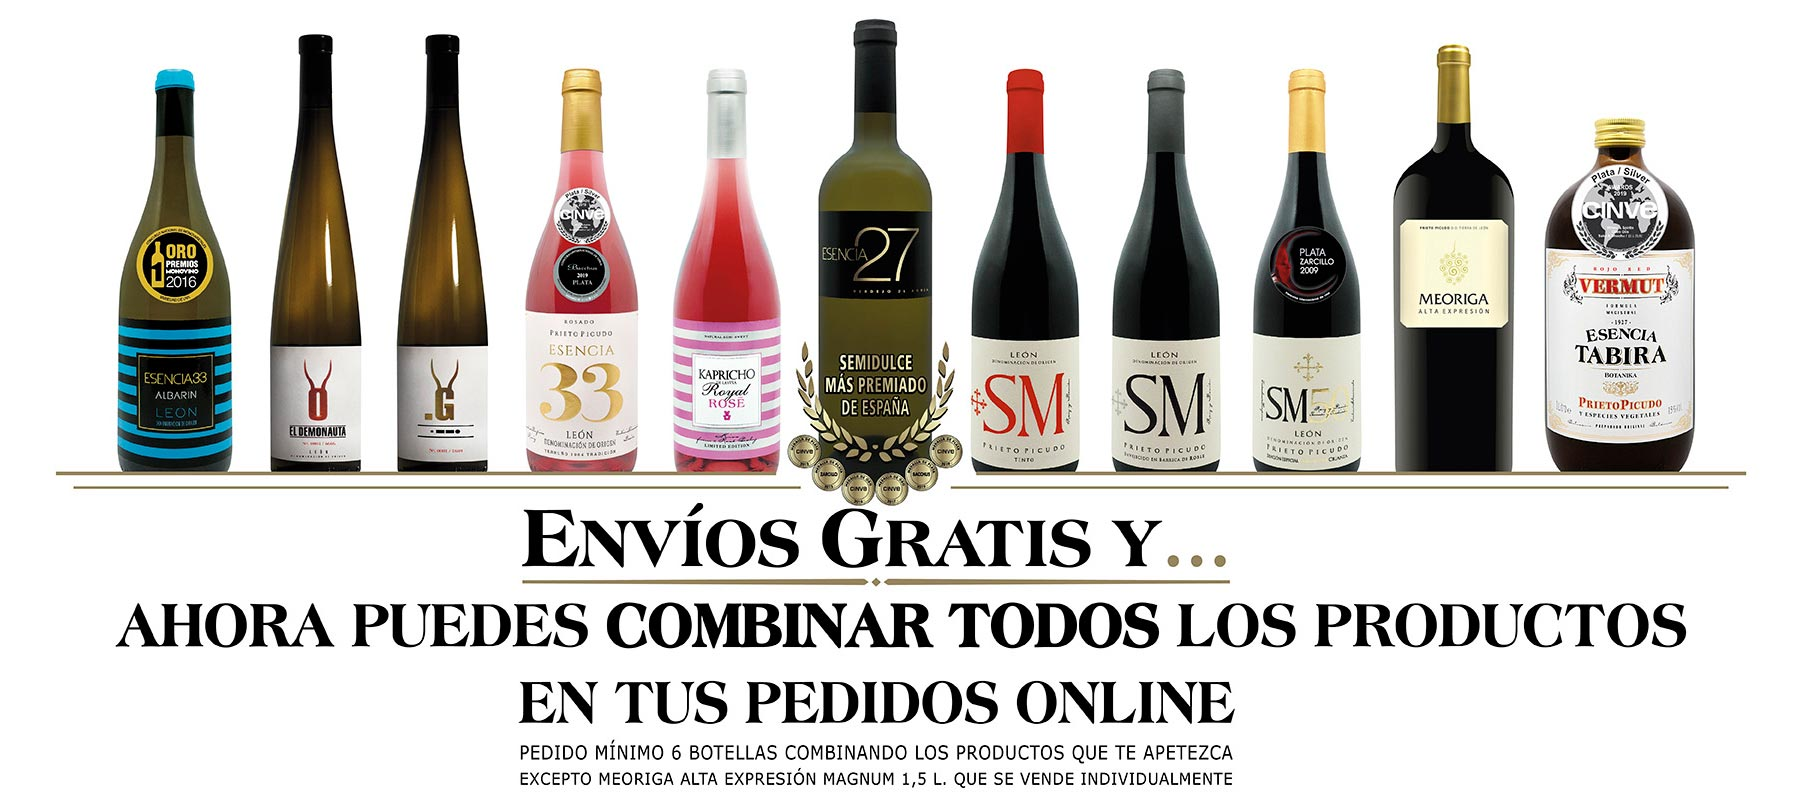 bodegas_meoriga_vinos